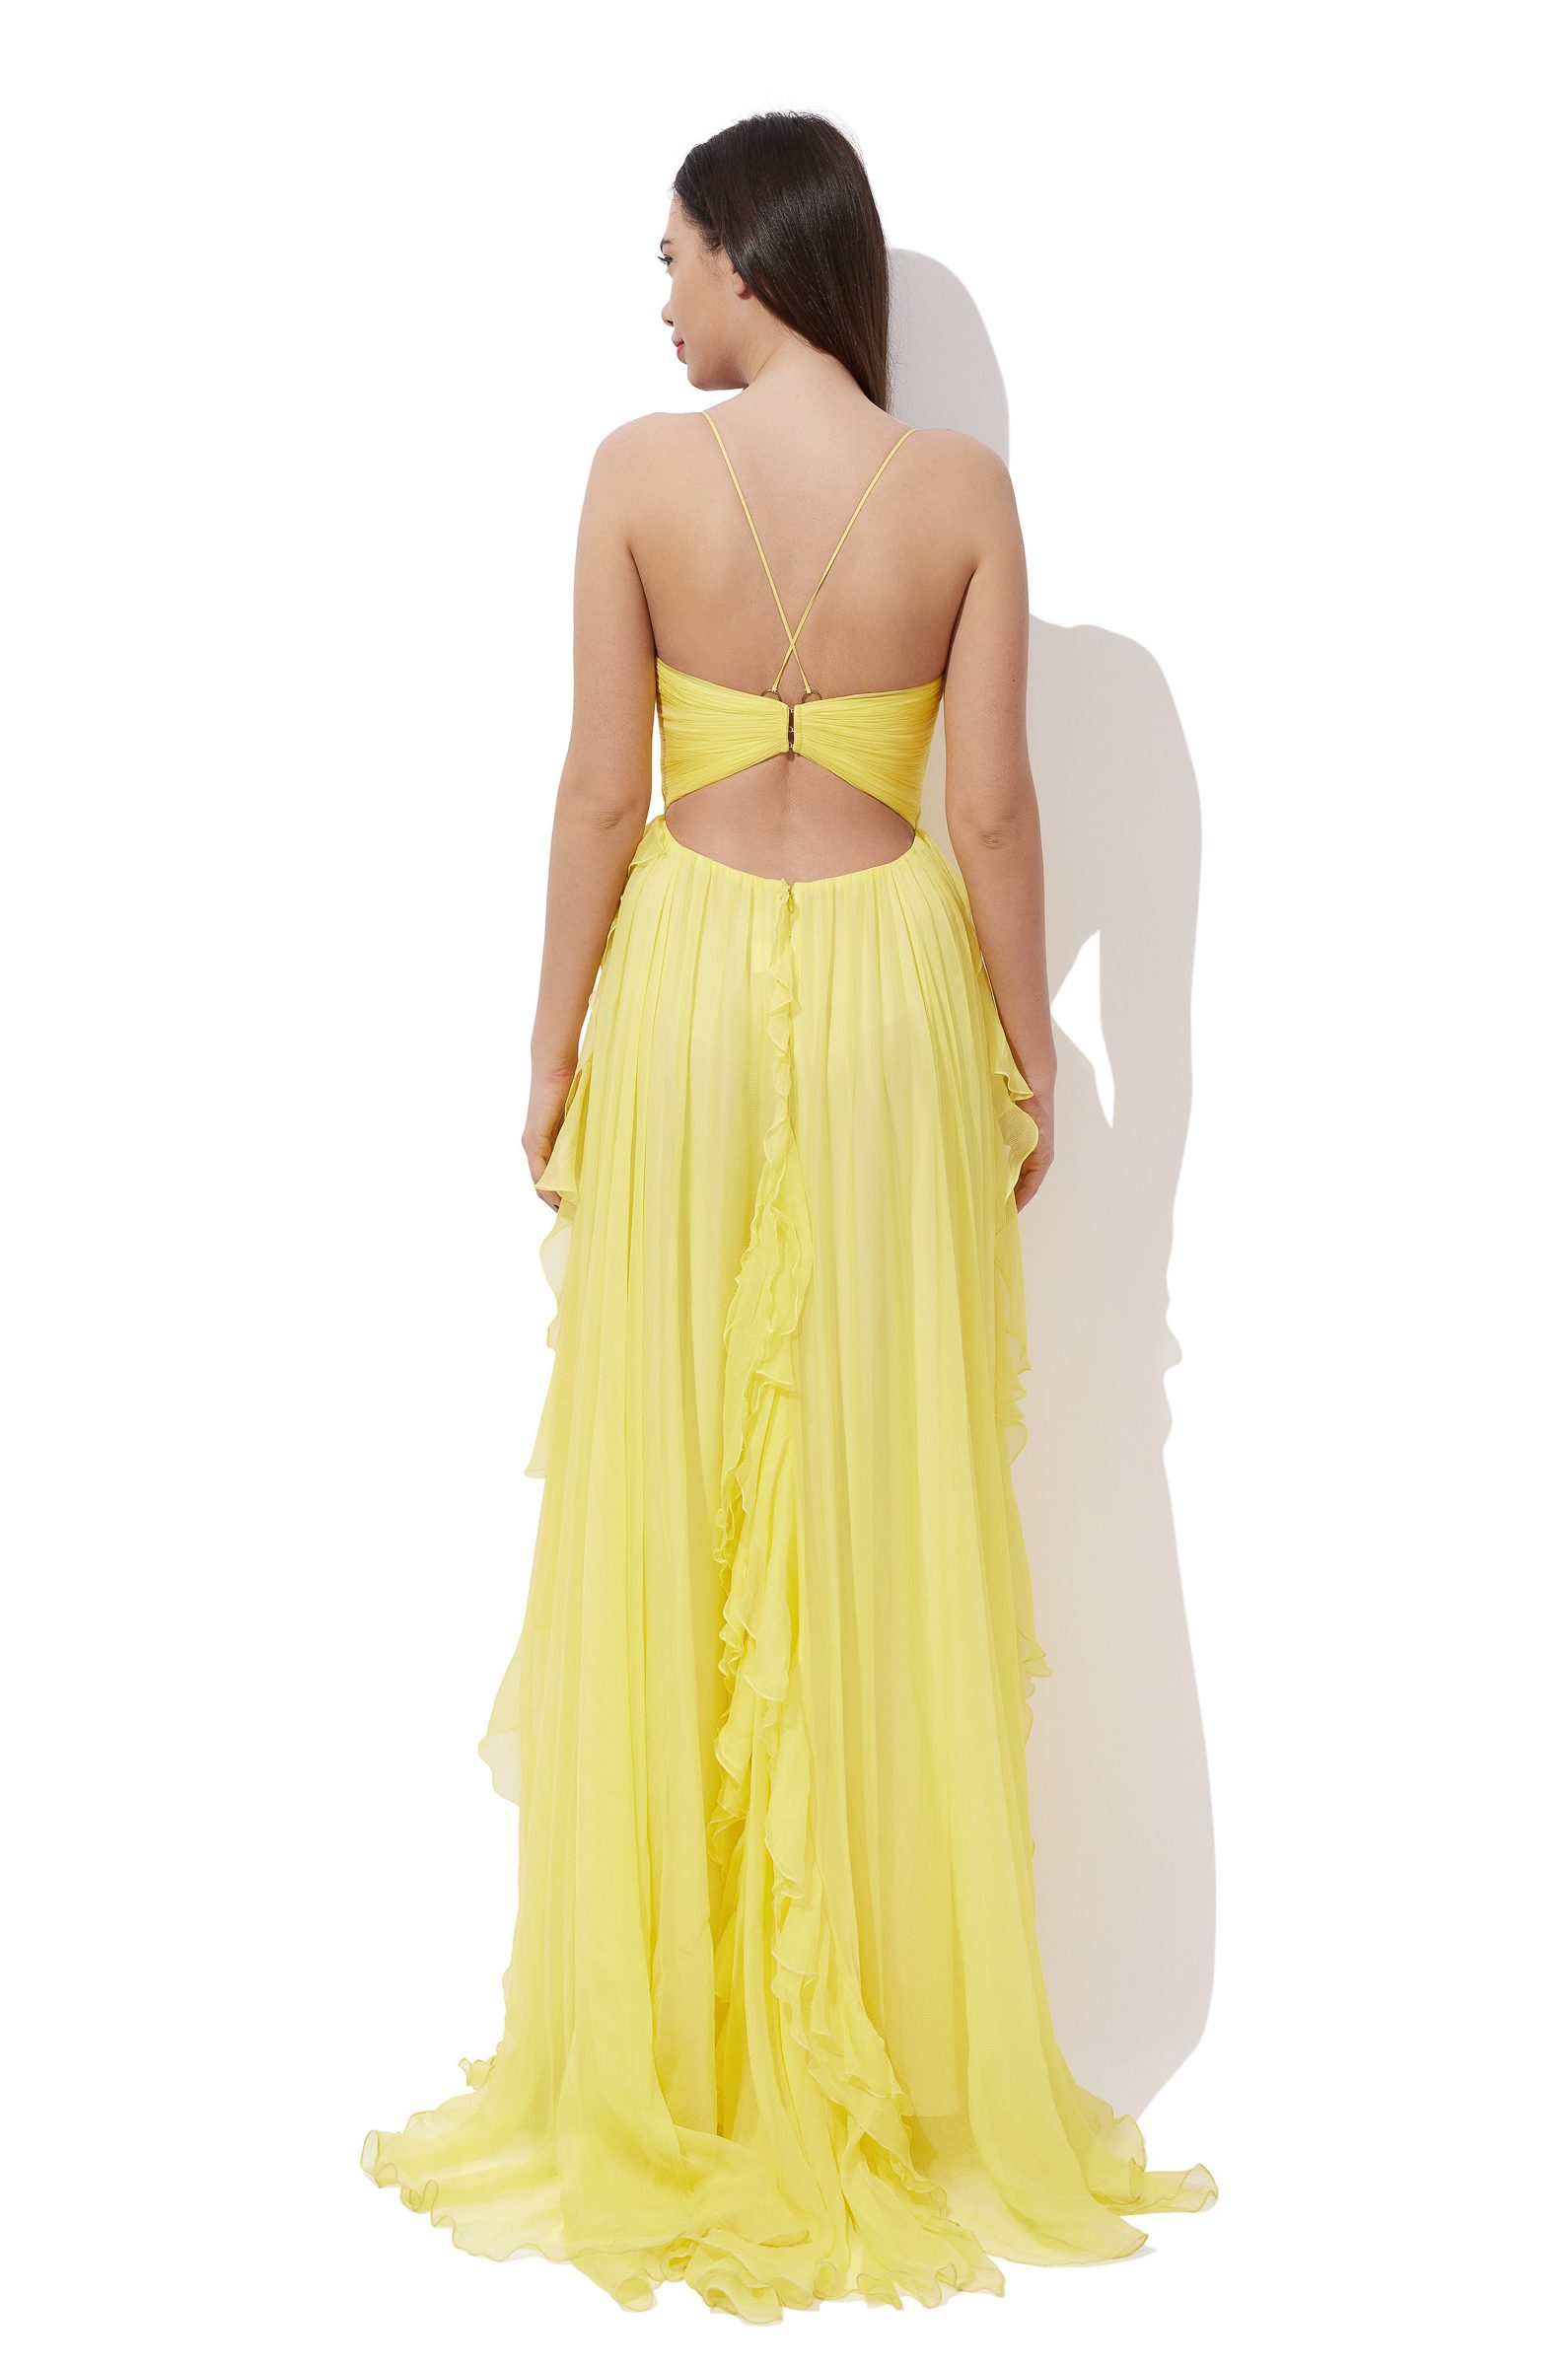 Draped silk corset dress